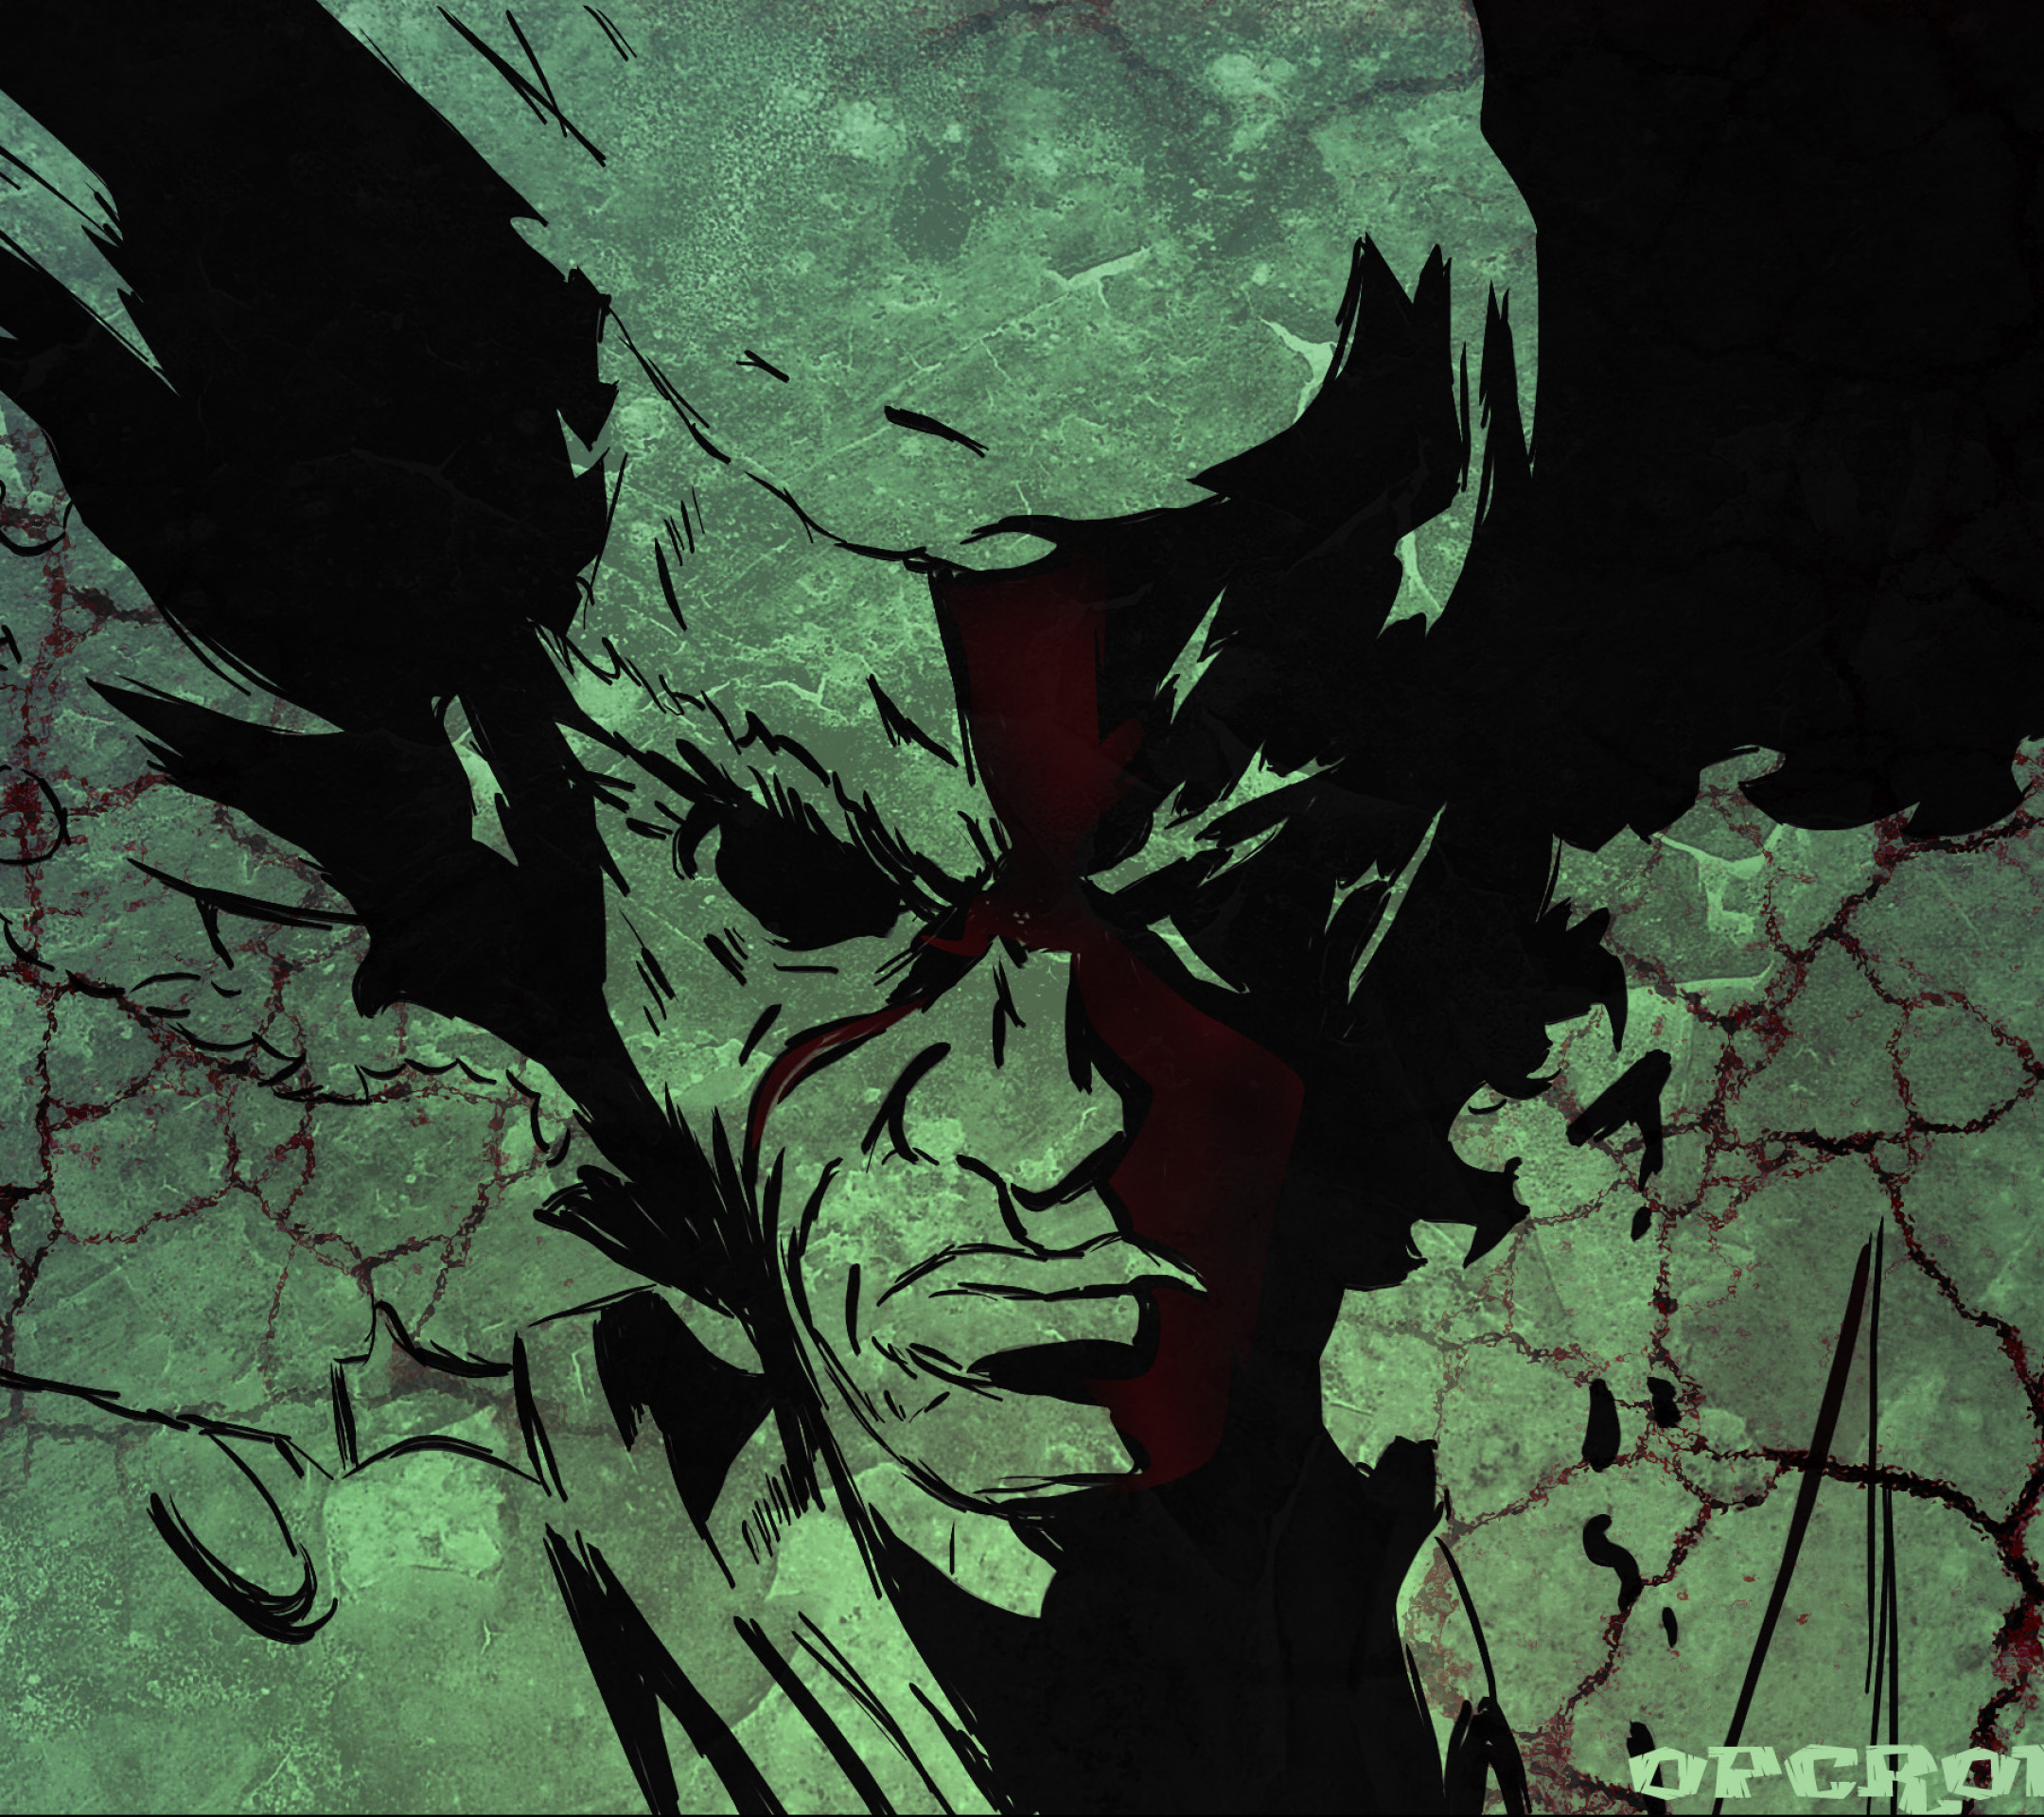 Anime Afro Samurai. Wallpaper 528270